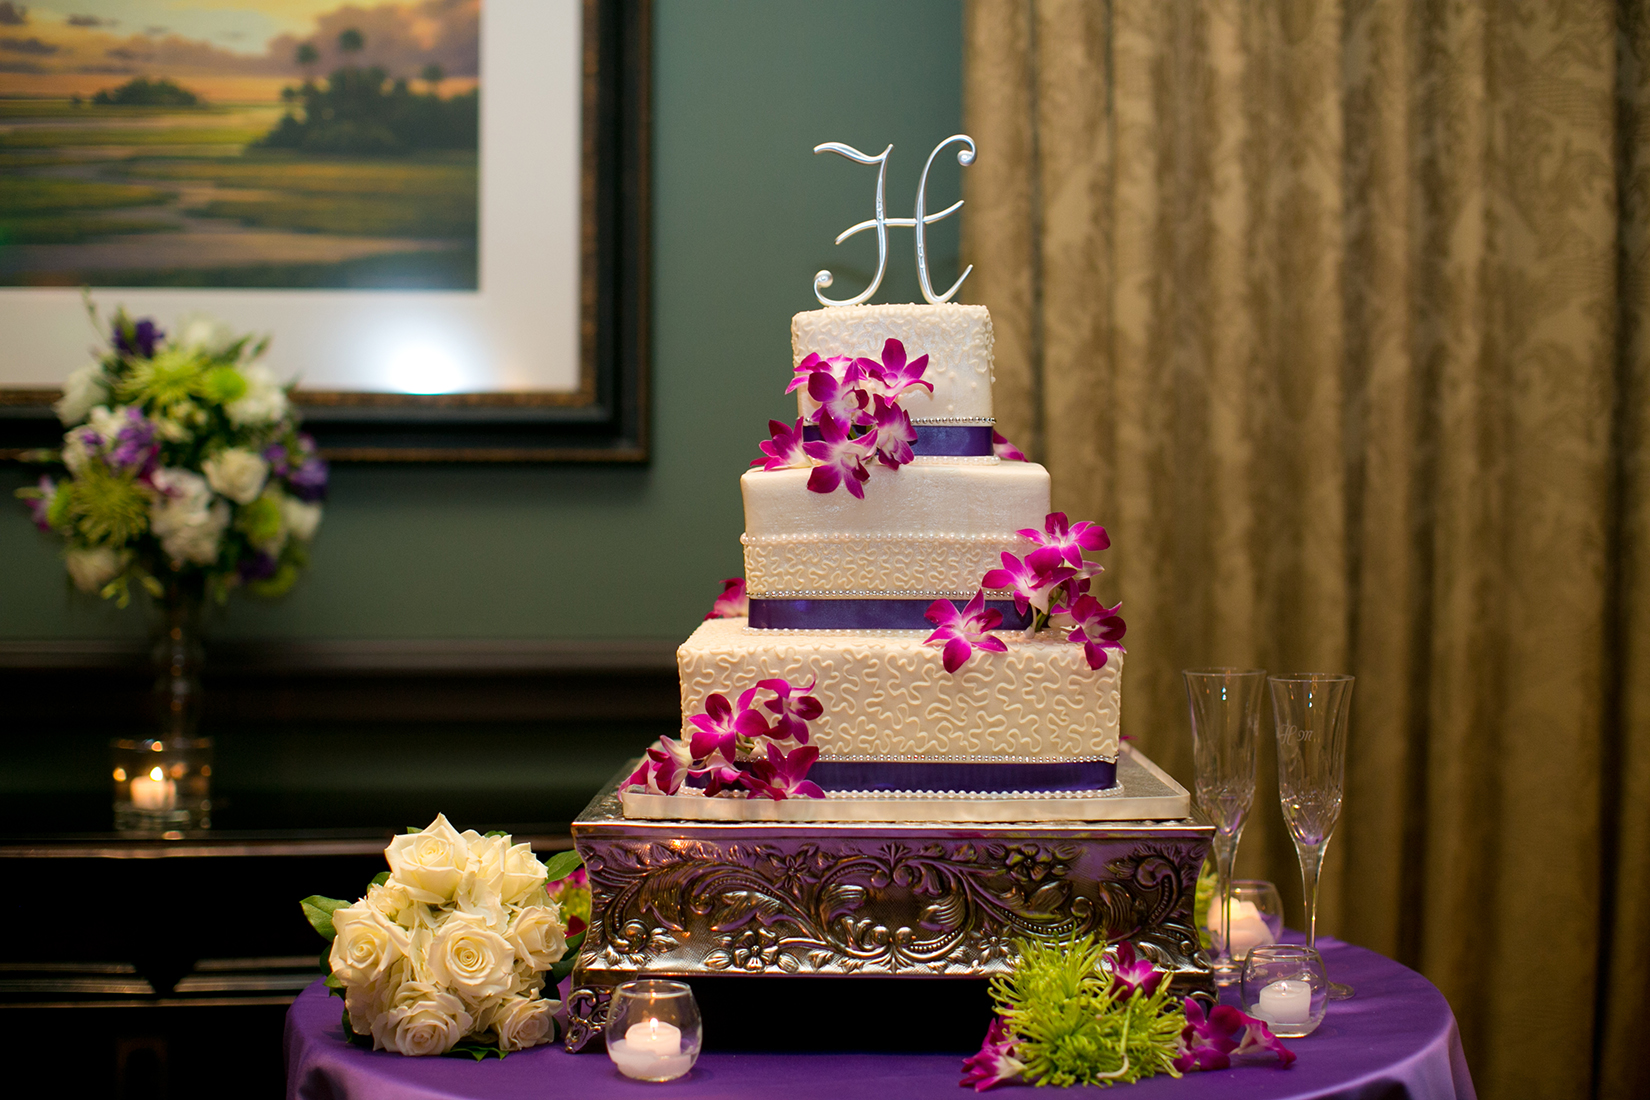 adam-szarmack-tpc-sawgrass-ponte-vedra-wedding-photographer-PZ3A9746.jpg